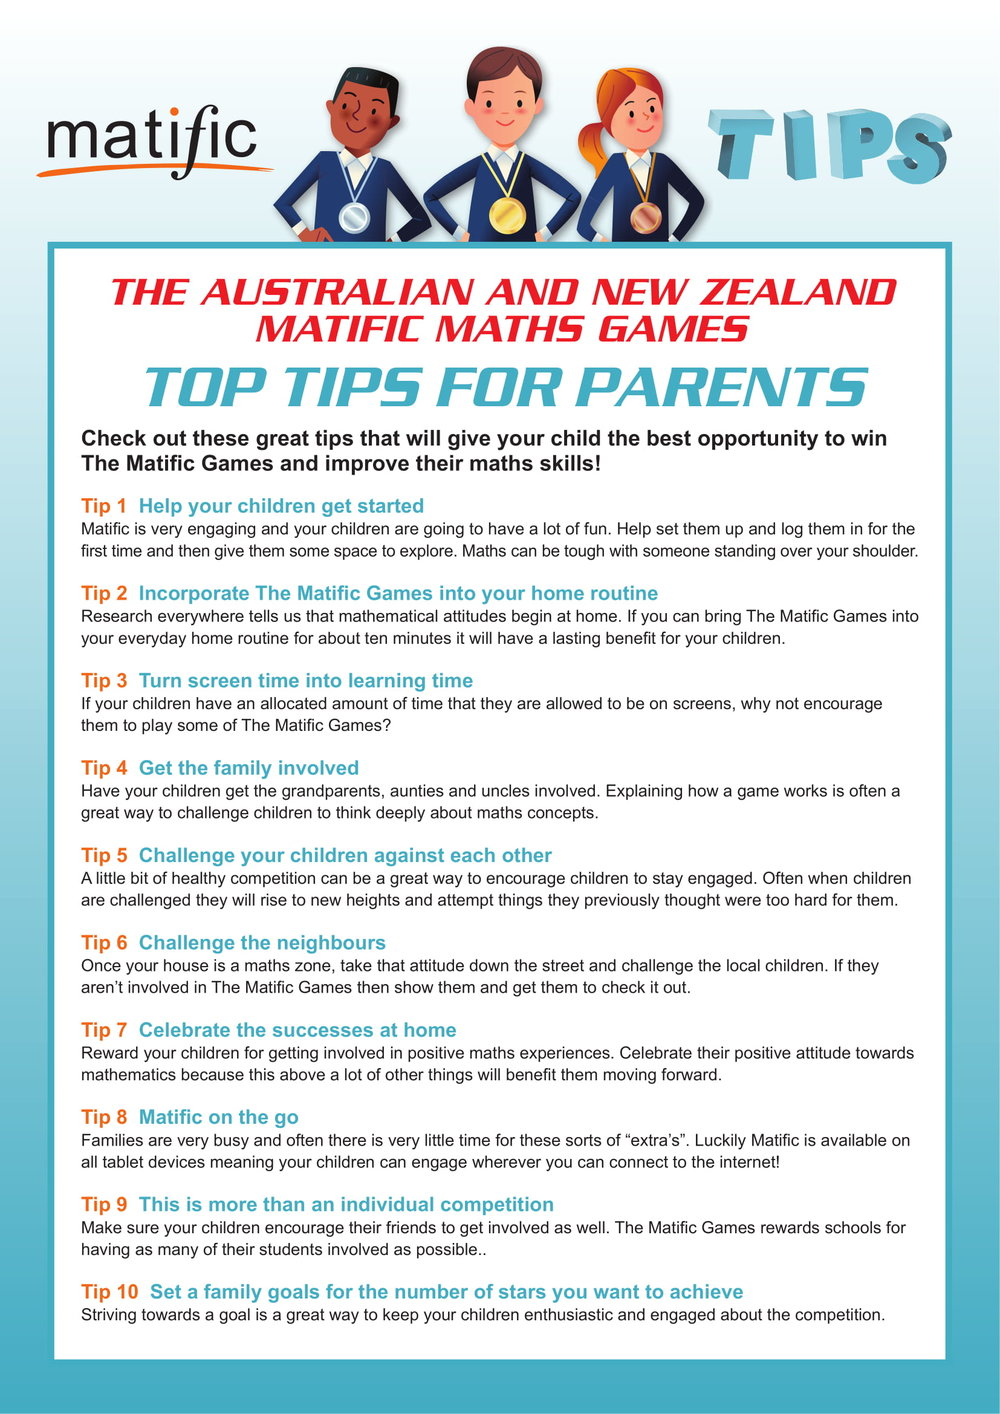 AU-NZ_Games_Tips_Parent-1.jpg